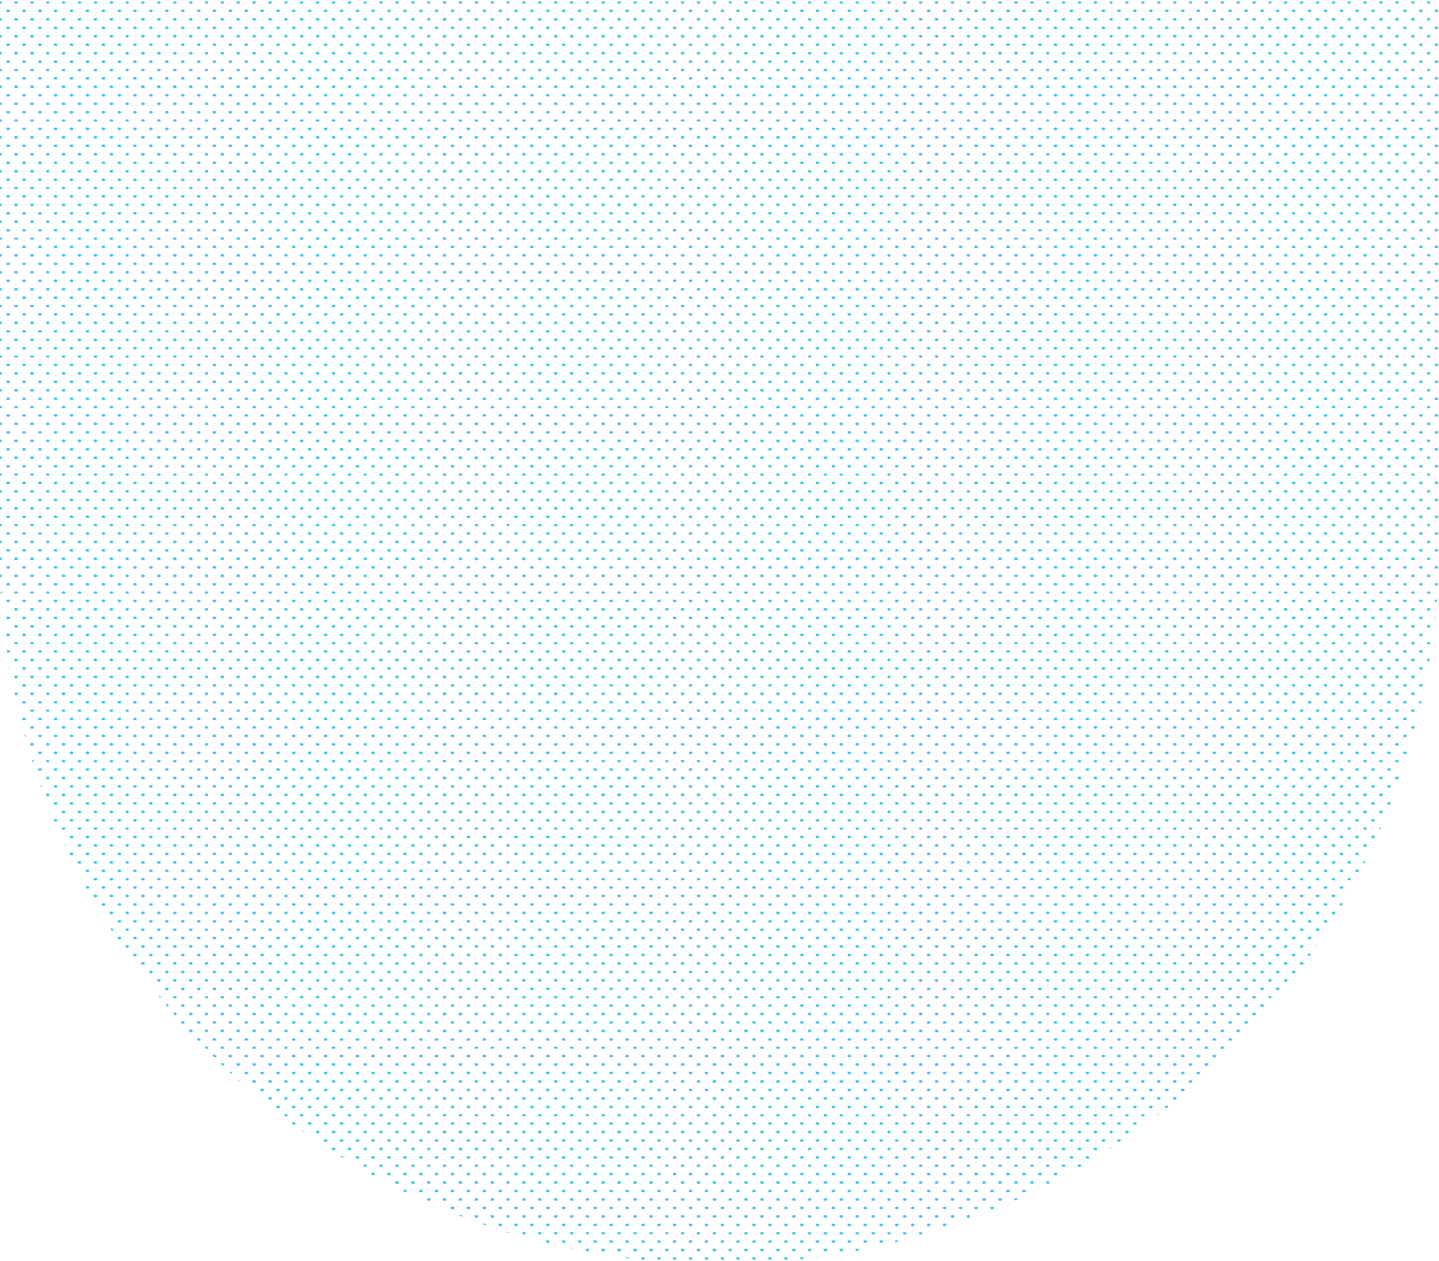 background pattern - homepage